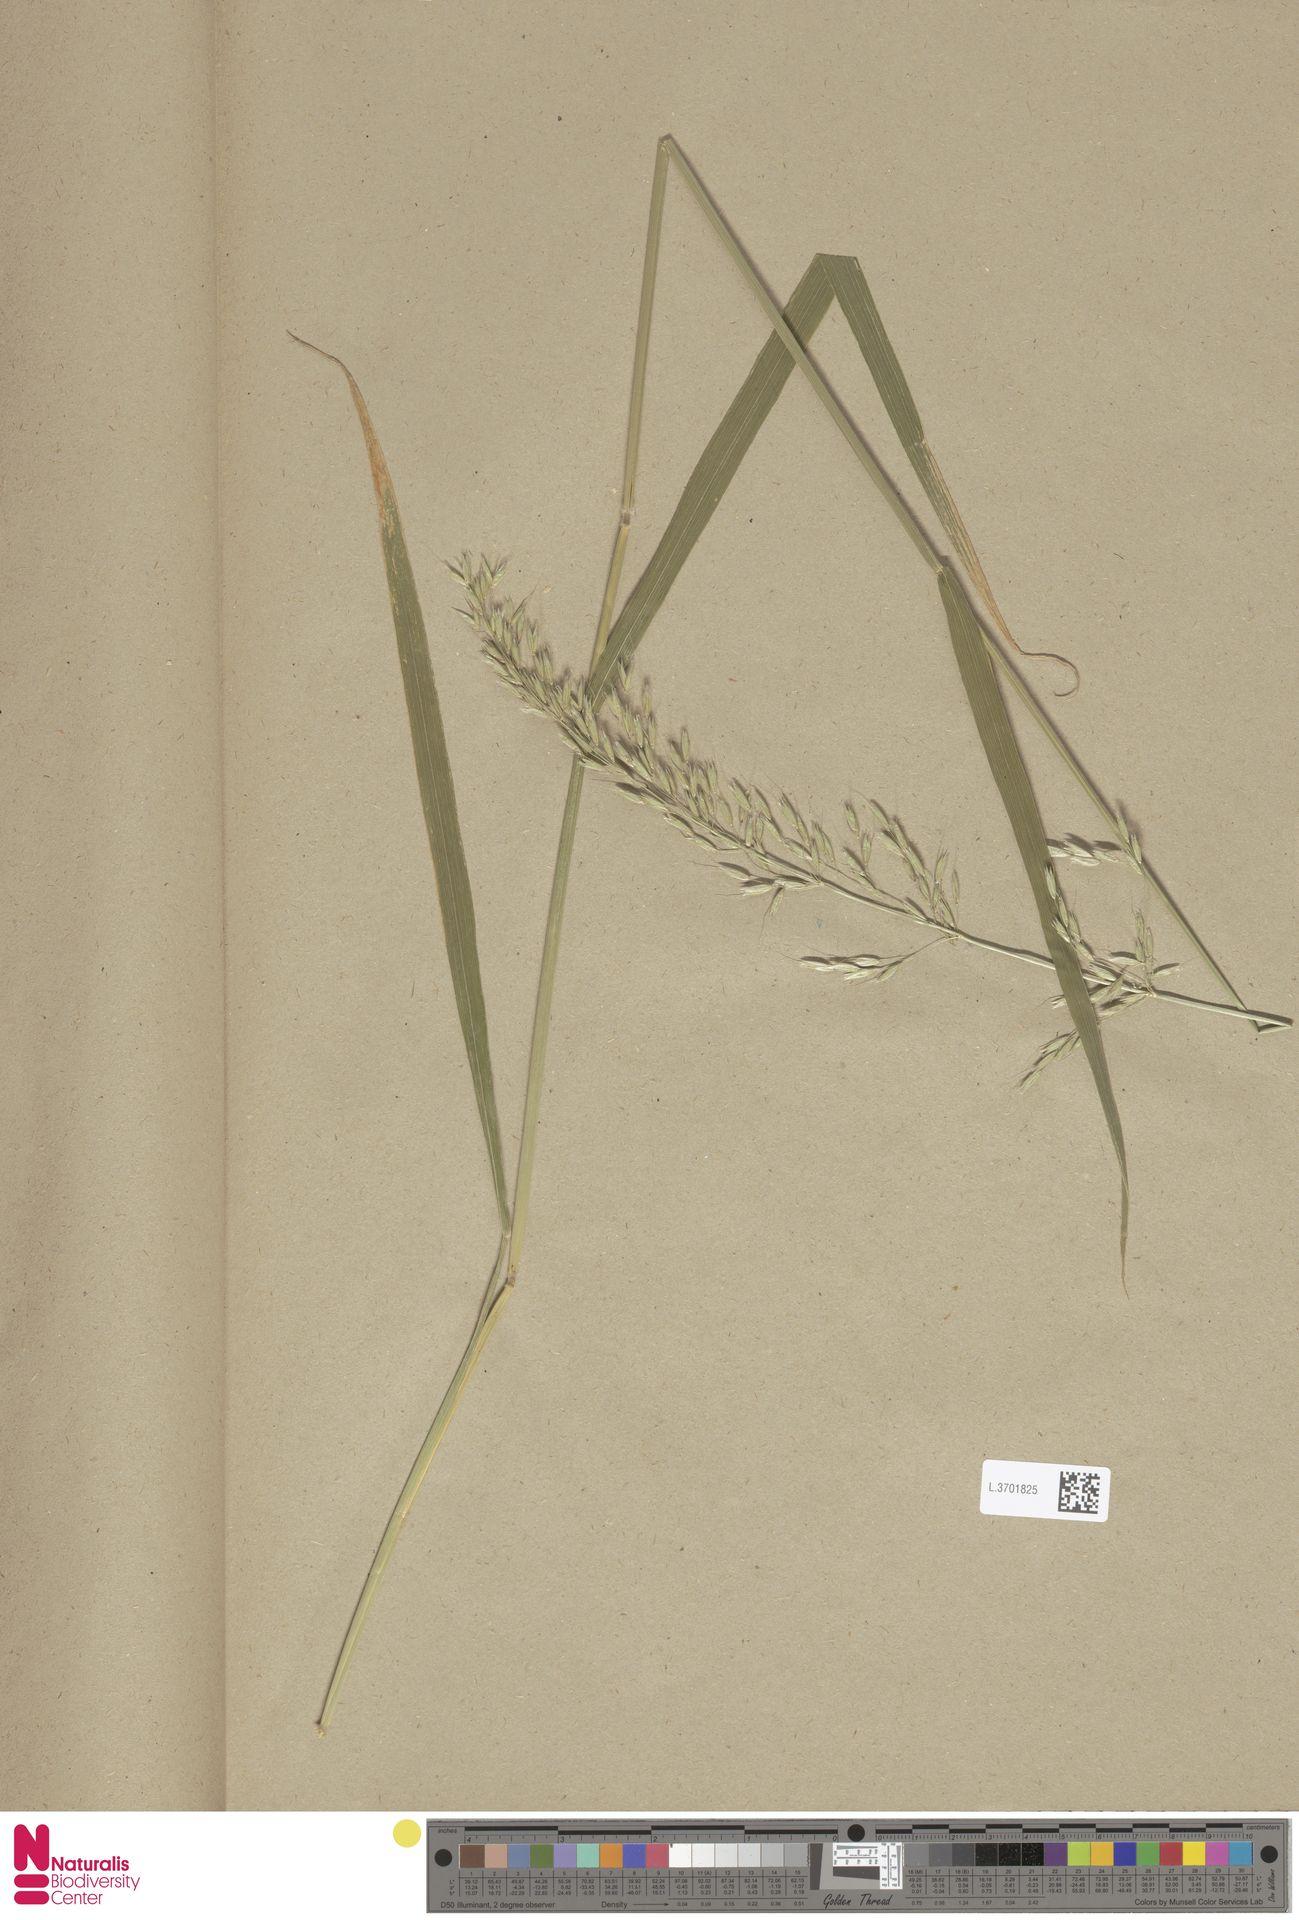 L.3701825 | Arrhenatherum elatius (L.) P.Beauv. ex J.Presl & C.Presl